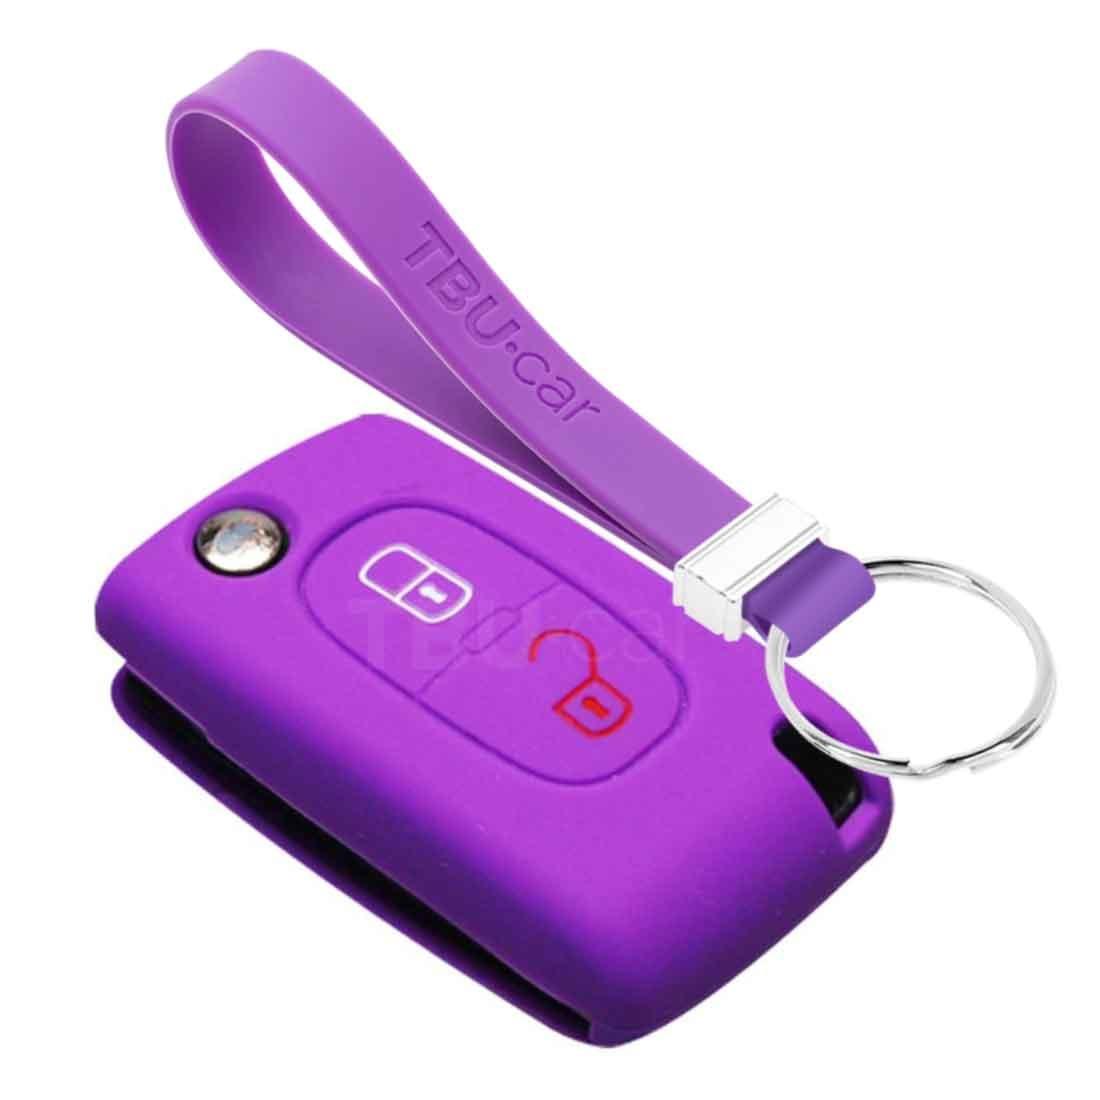 TBU car TBU car Sleutel cover compatibel met Citroën - Silicone sleutelhoesje - beschermhoesje autosleutel - Paars